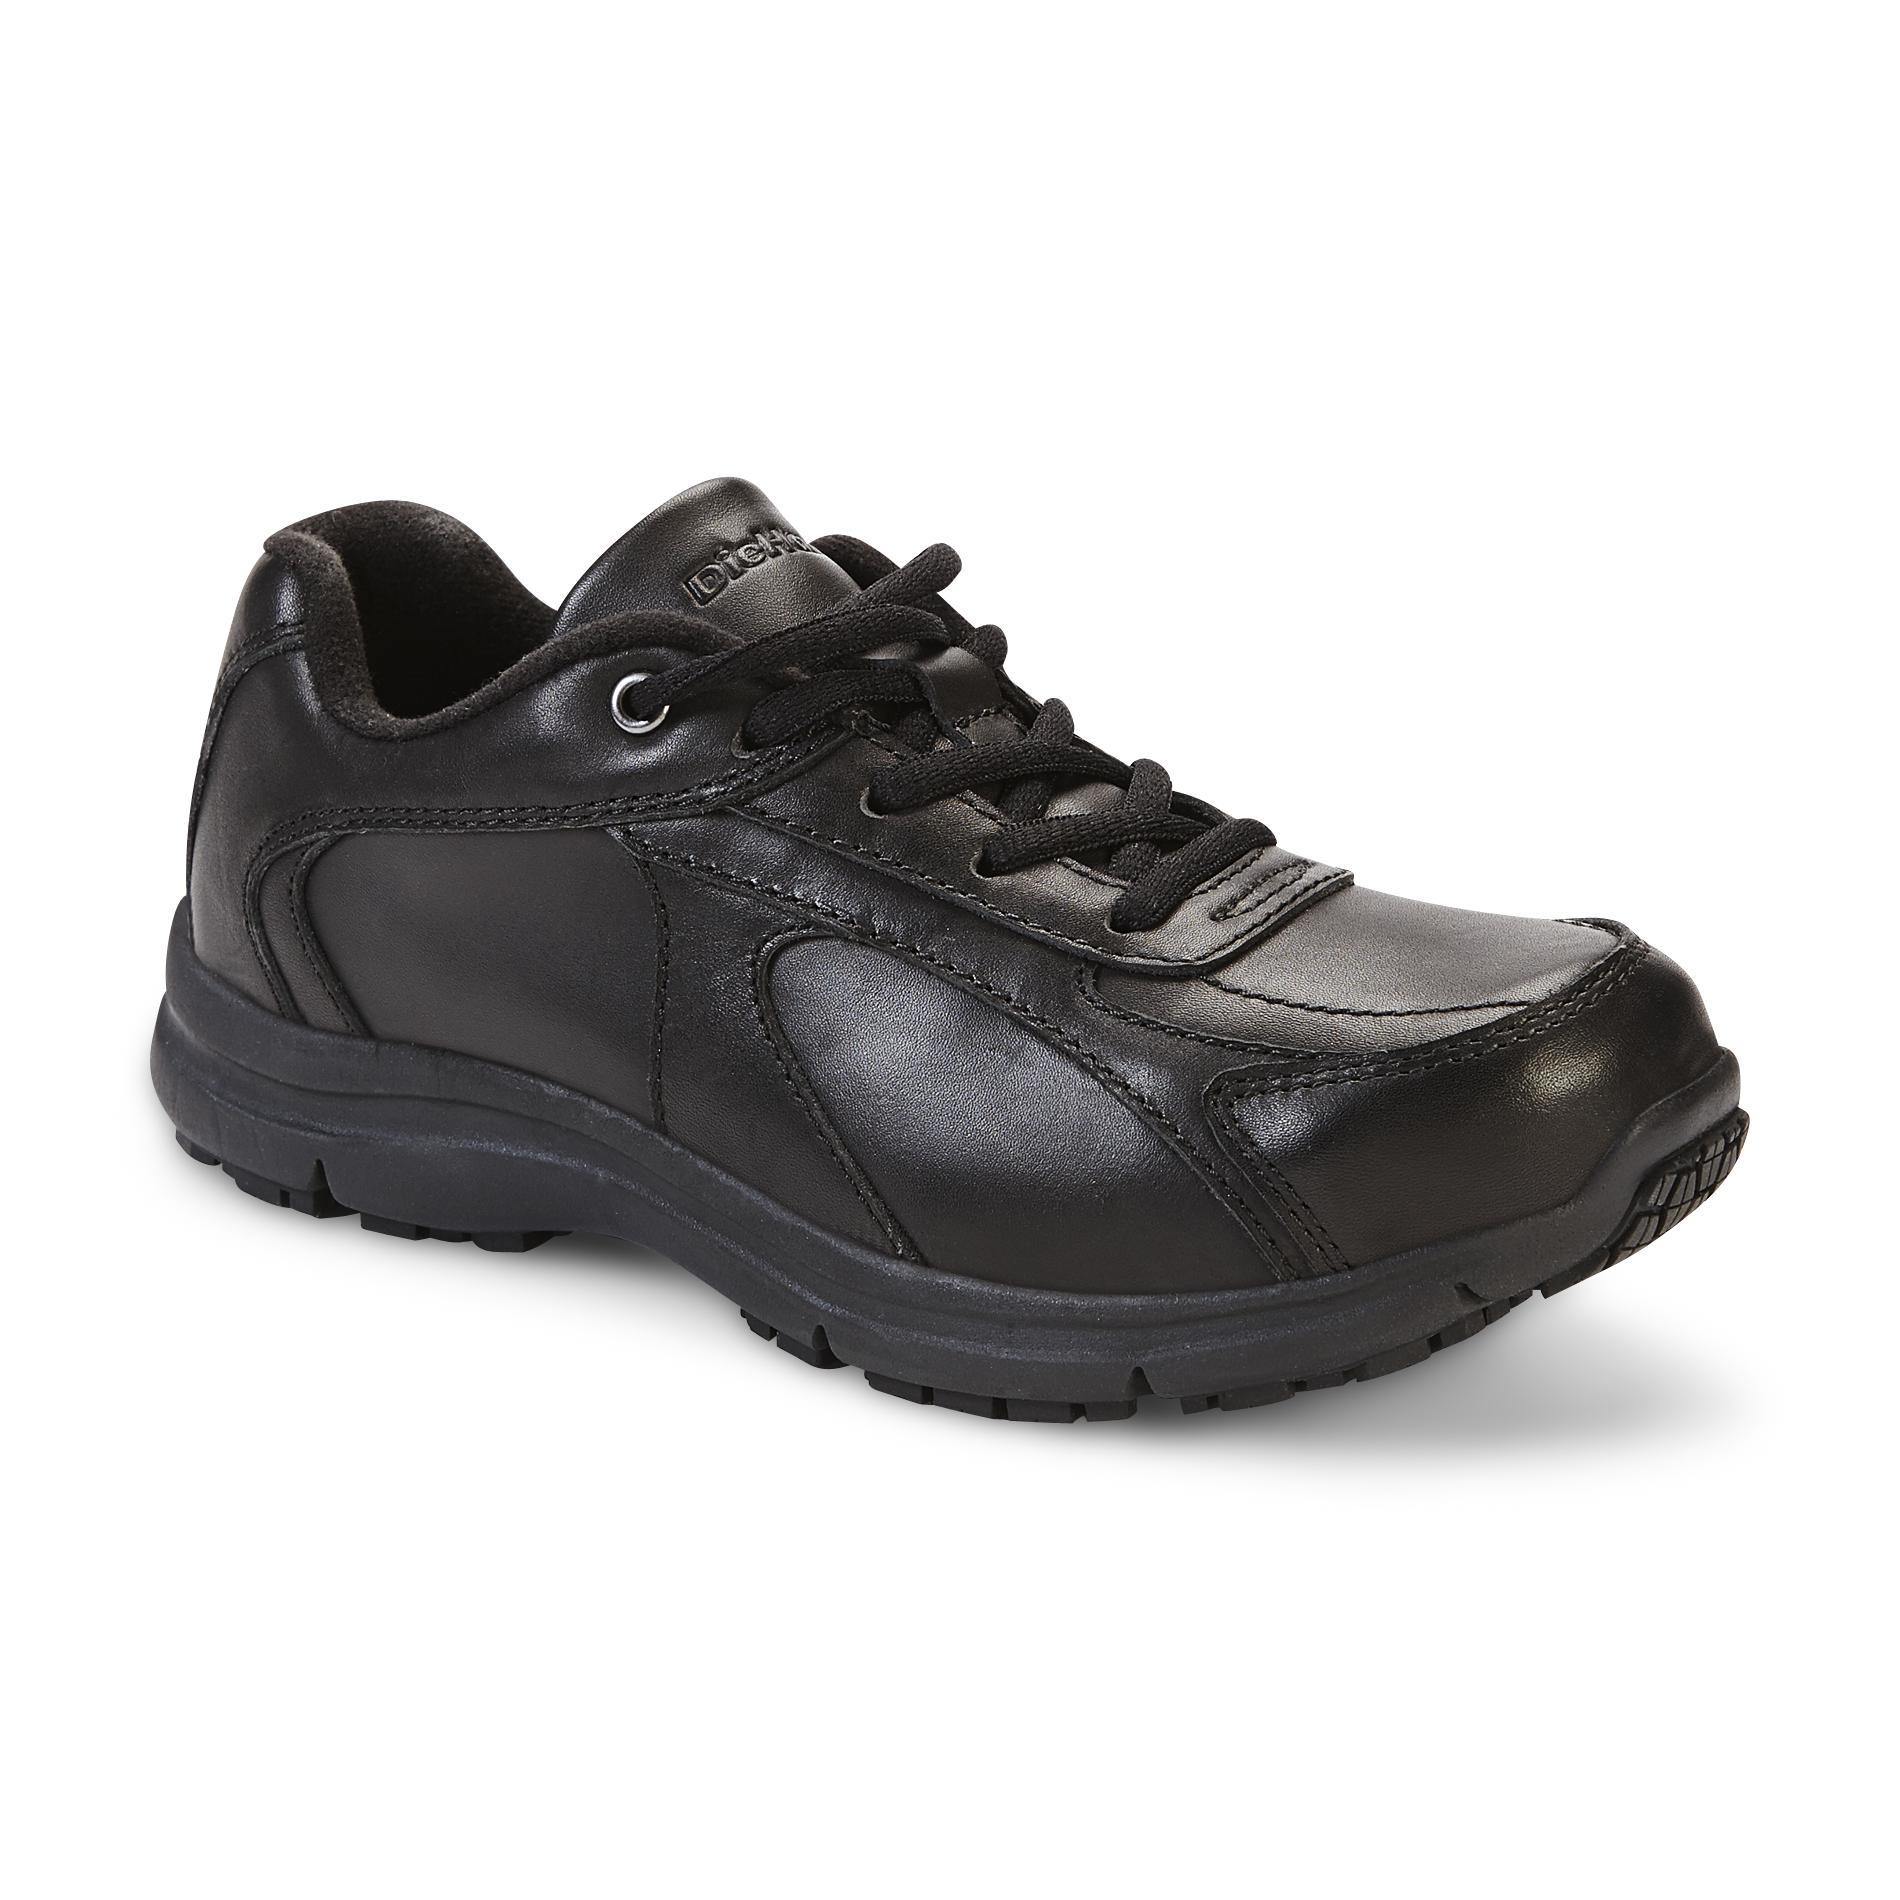 Diehard Women' Addison Slip Resistant Work Oxford - Black